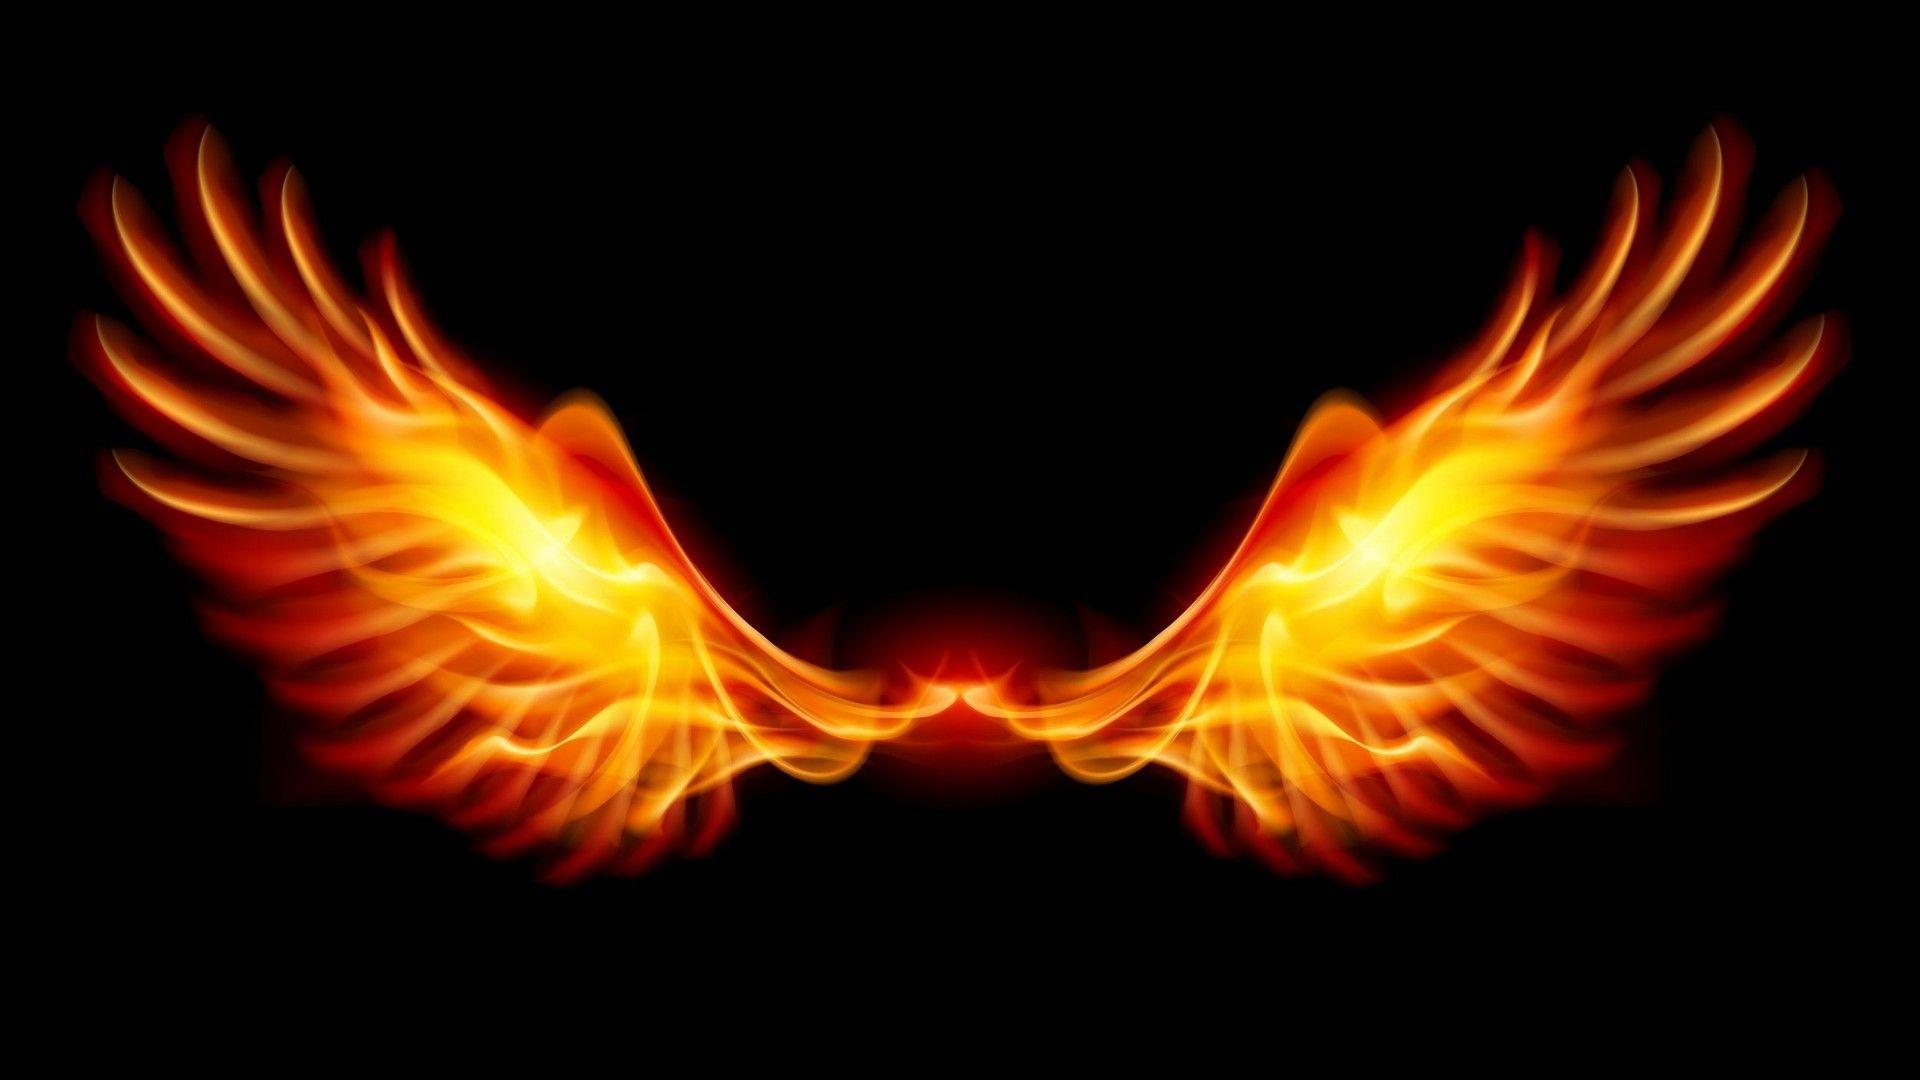 Phoenix Bird Desktop Backgrounds Hd Karya Seni 3d Gambar Bergerak Seni 3d